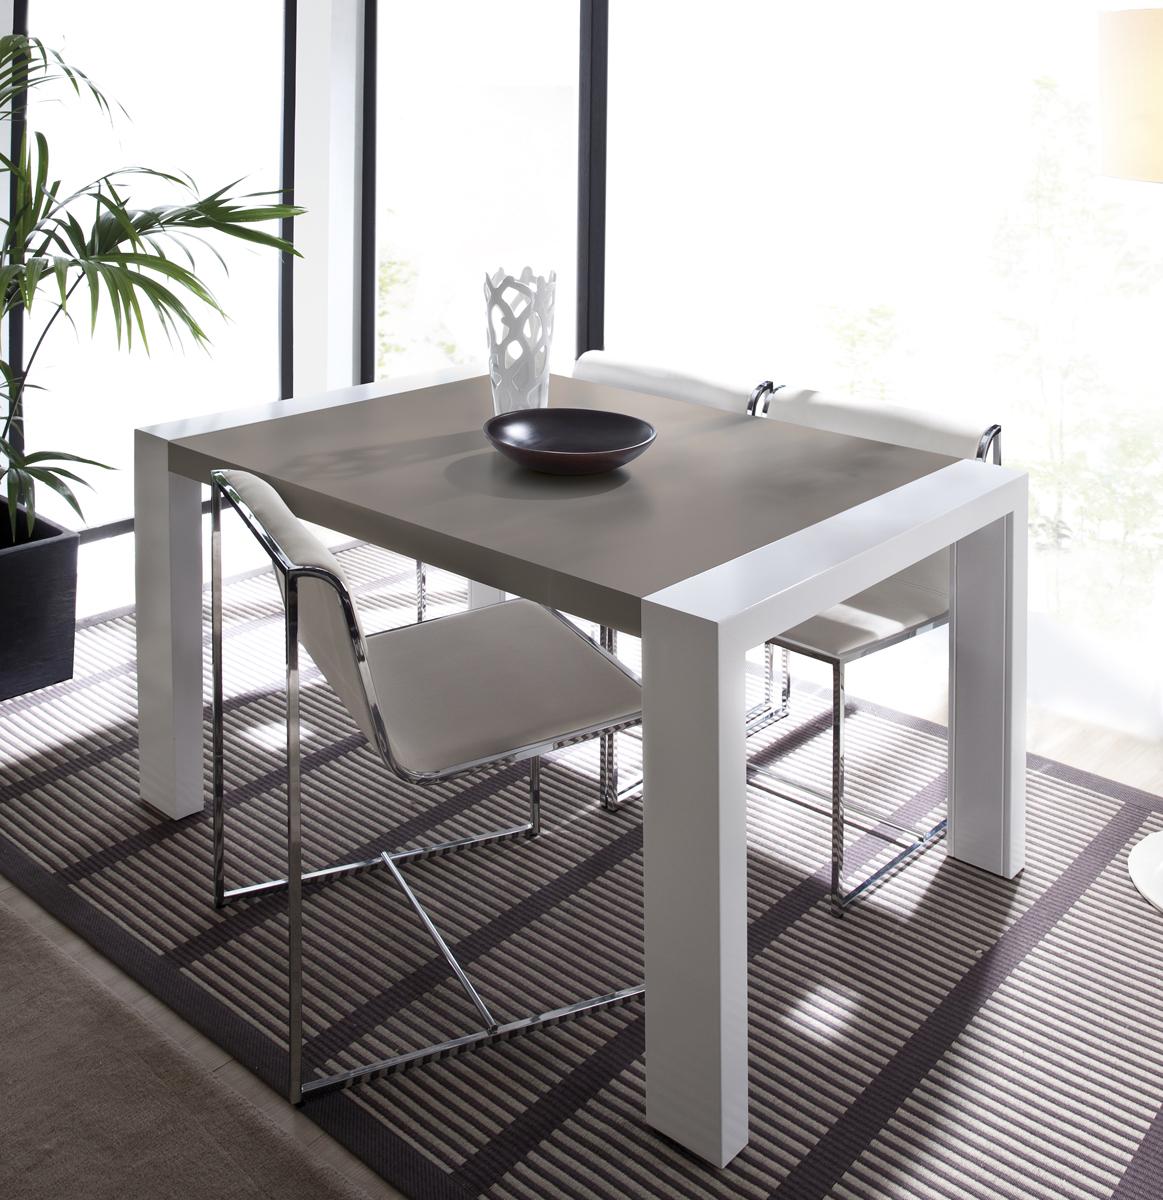 mesas-sillas-011